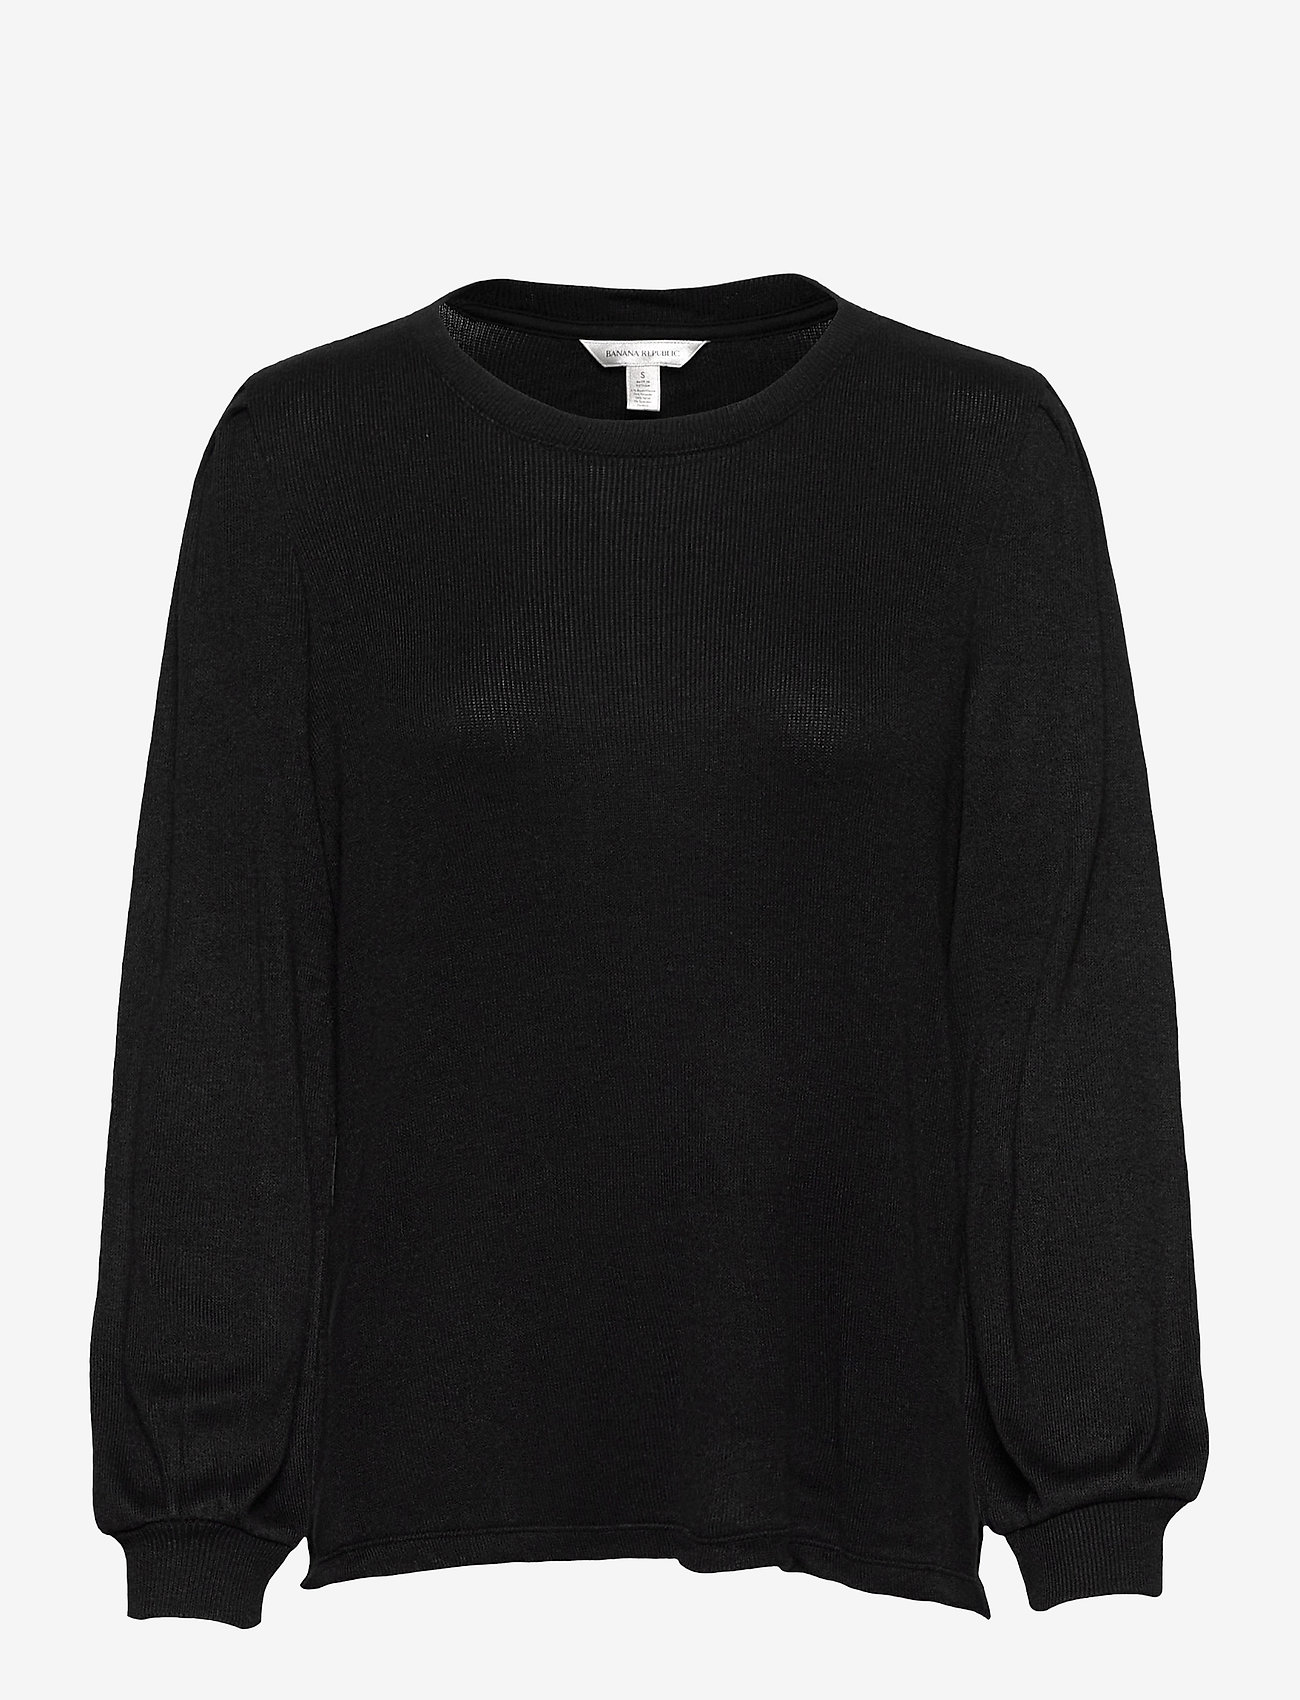 Banana Republic - Cozy Ribbed Puff Sleeve Top - long-sleeved tops - black - 0